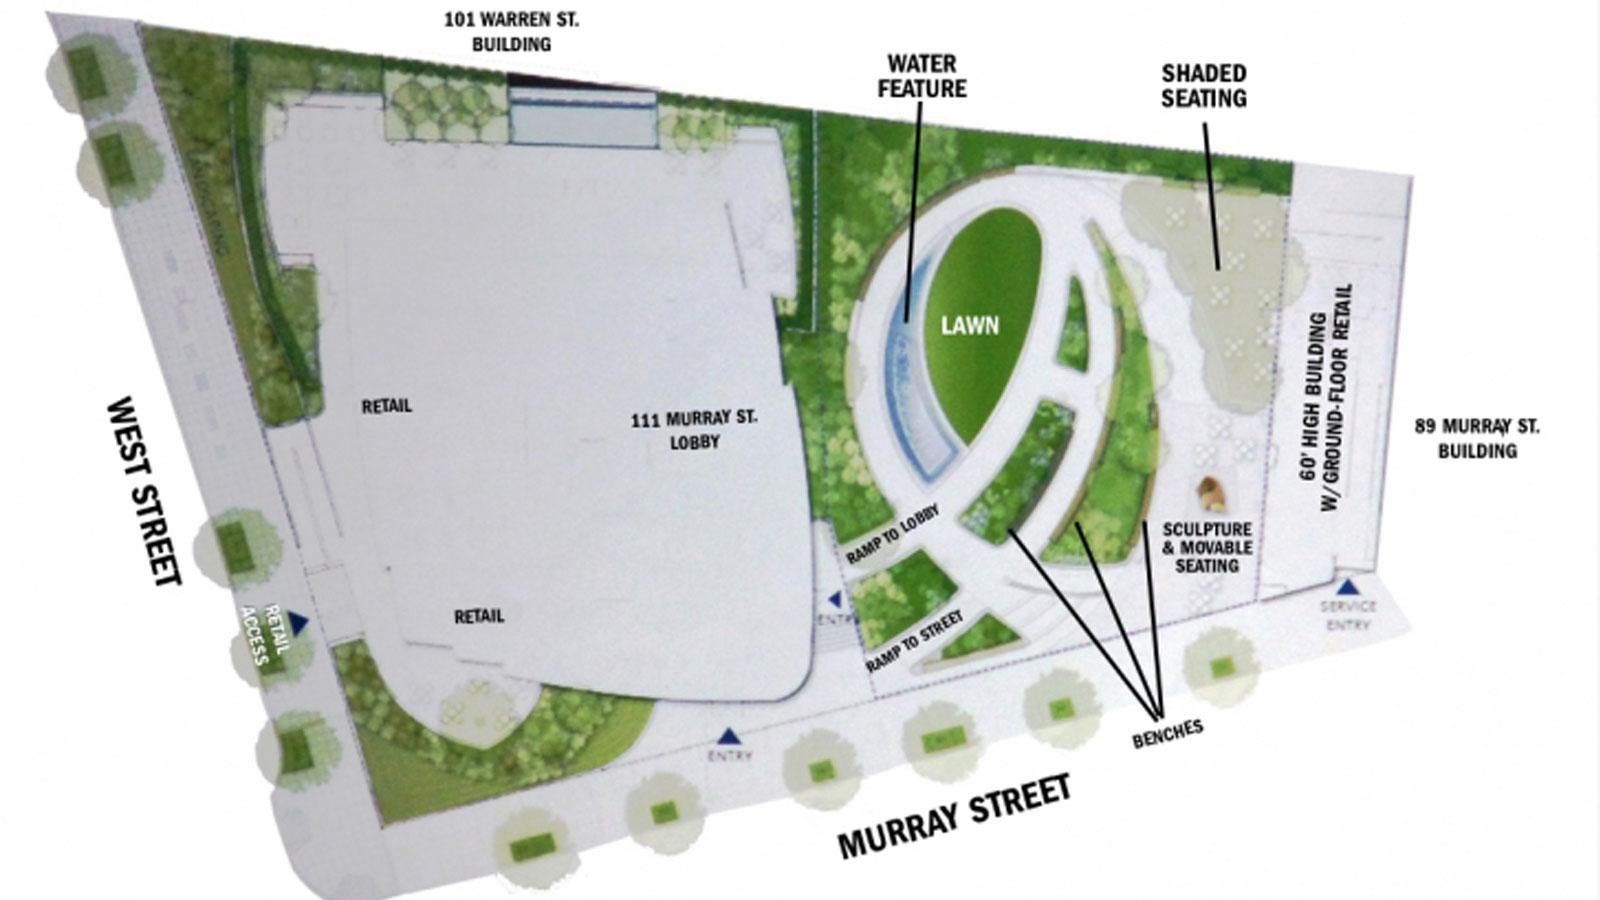 111 Murray Street